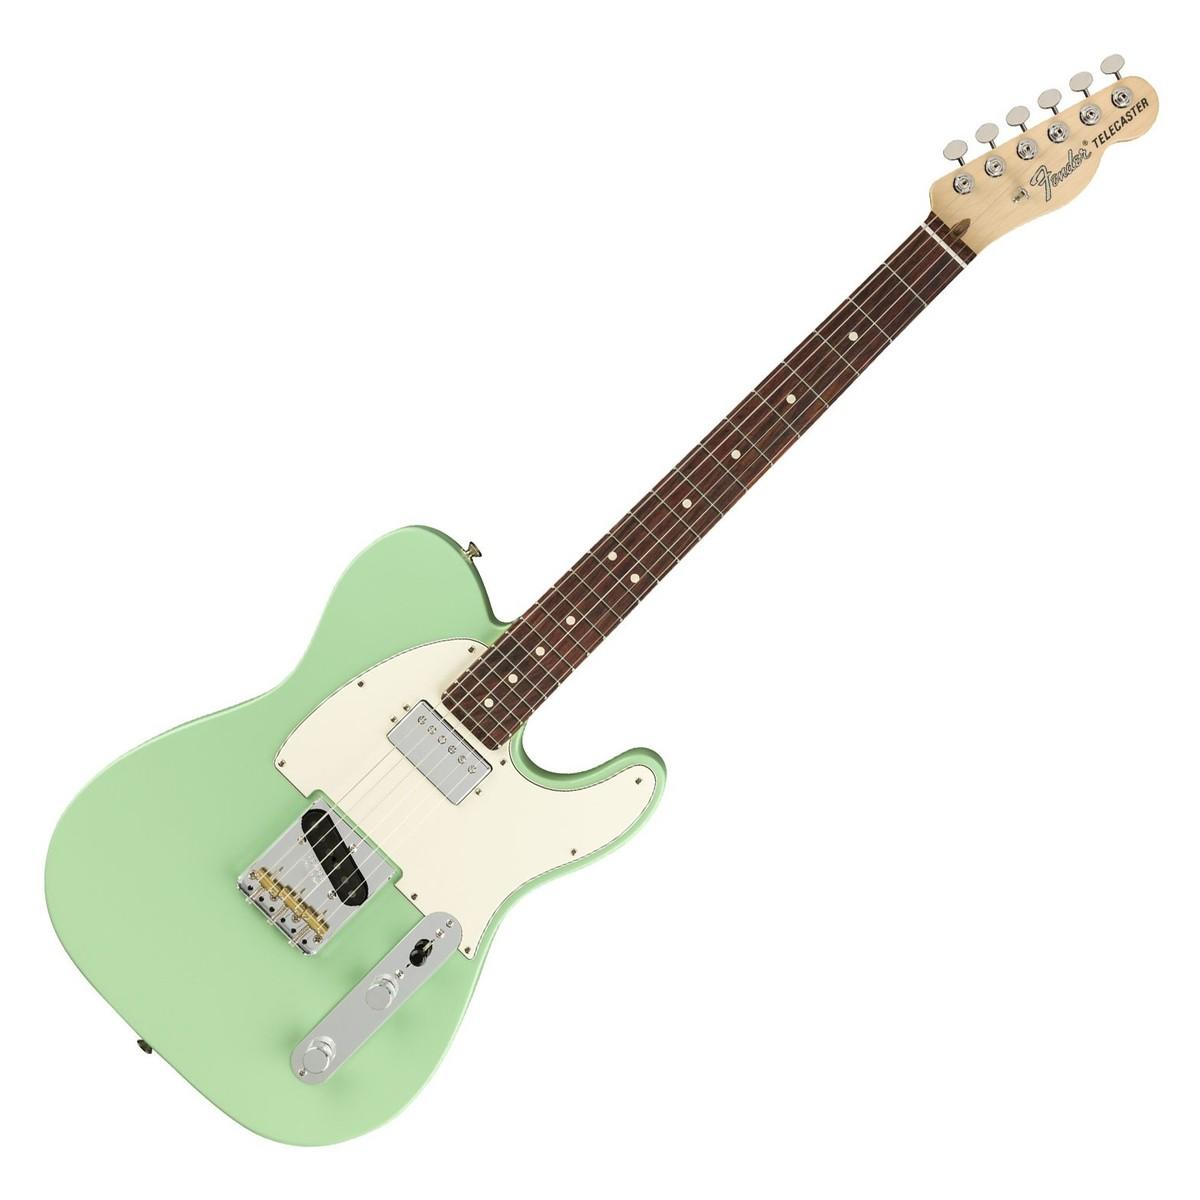 fender american performer telecaster hs rw satin surf green at gear4music. Black Bedroom Furniture Sets. Home Design Ideas